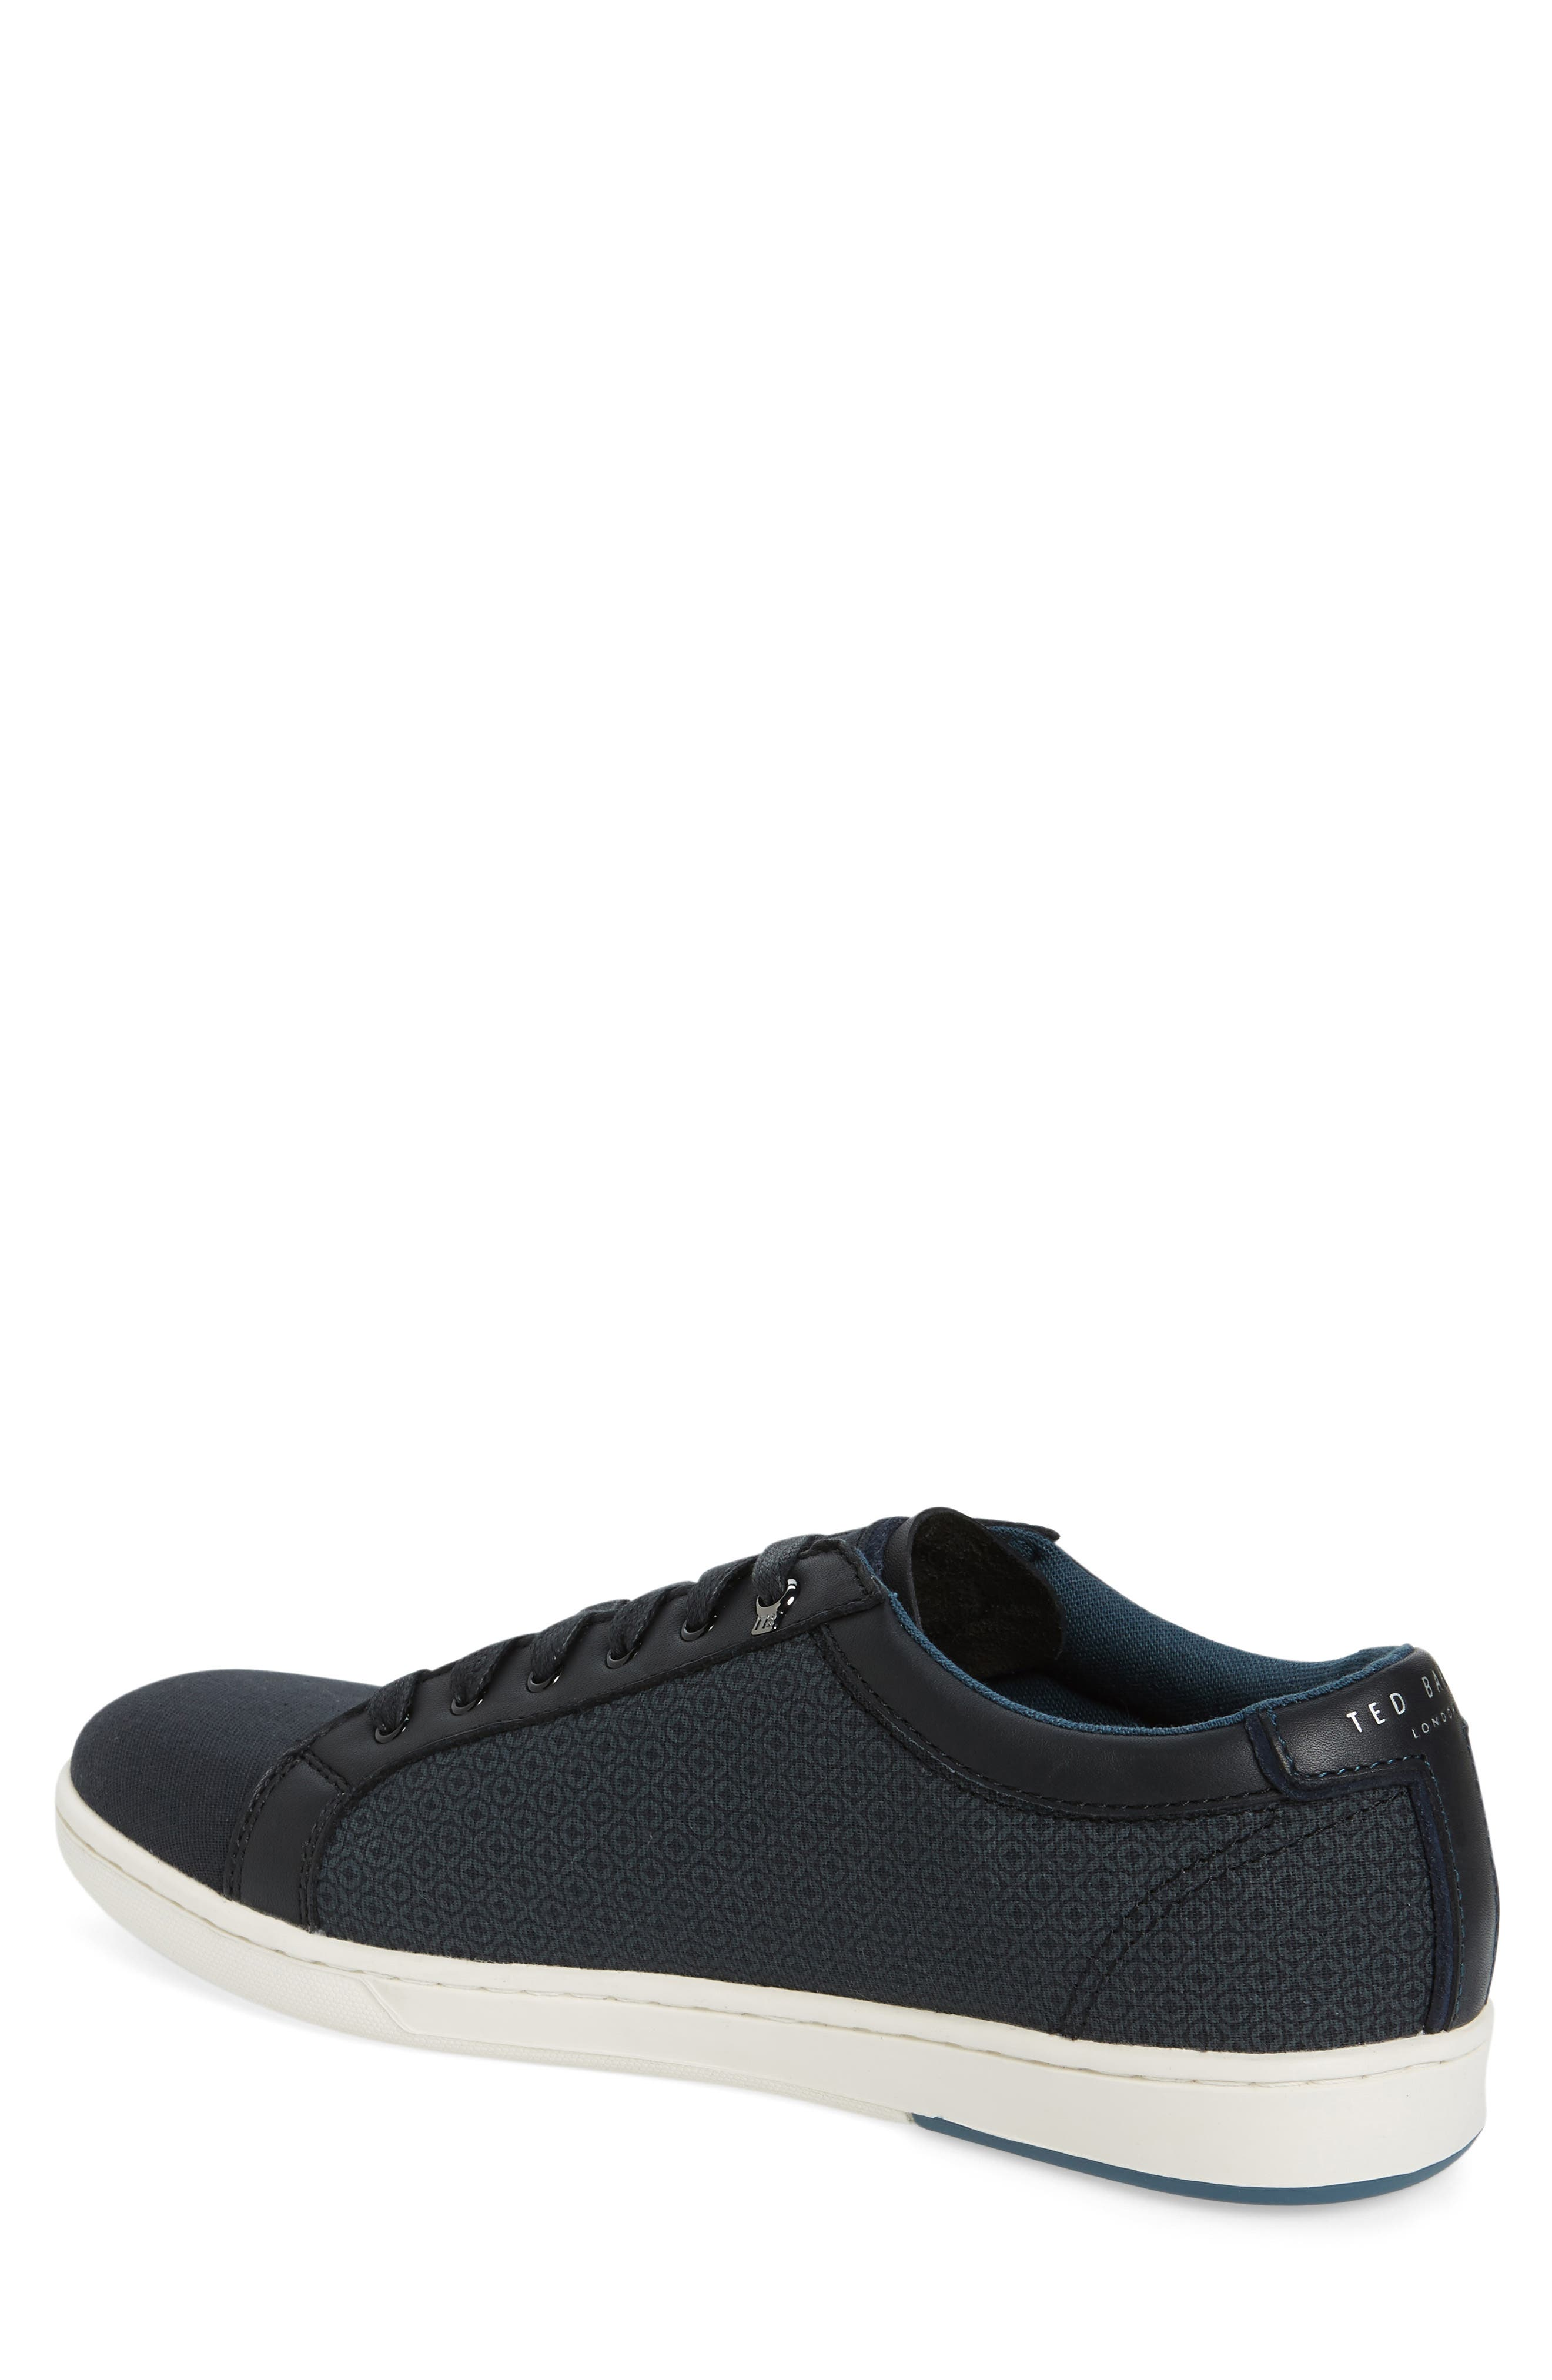 Ternur Geo Print Sneaker,                             Alternate thumbnail 2, color,                             011